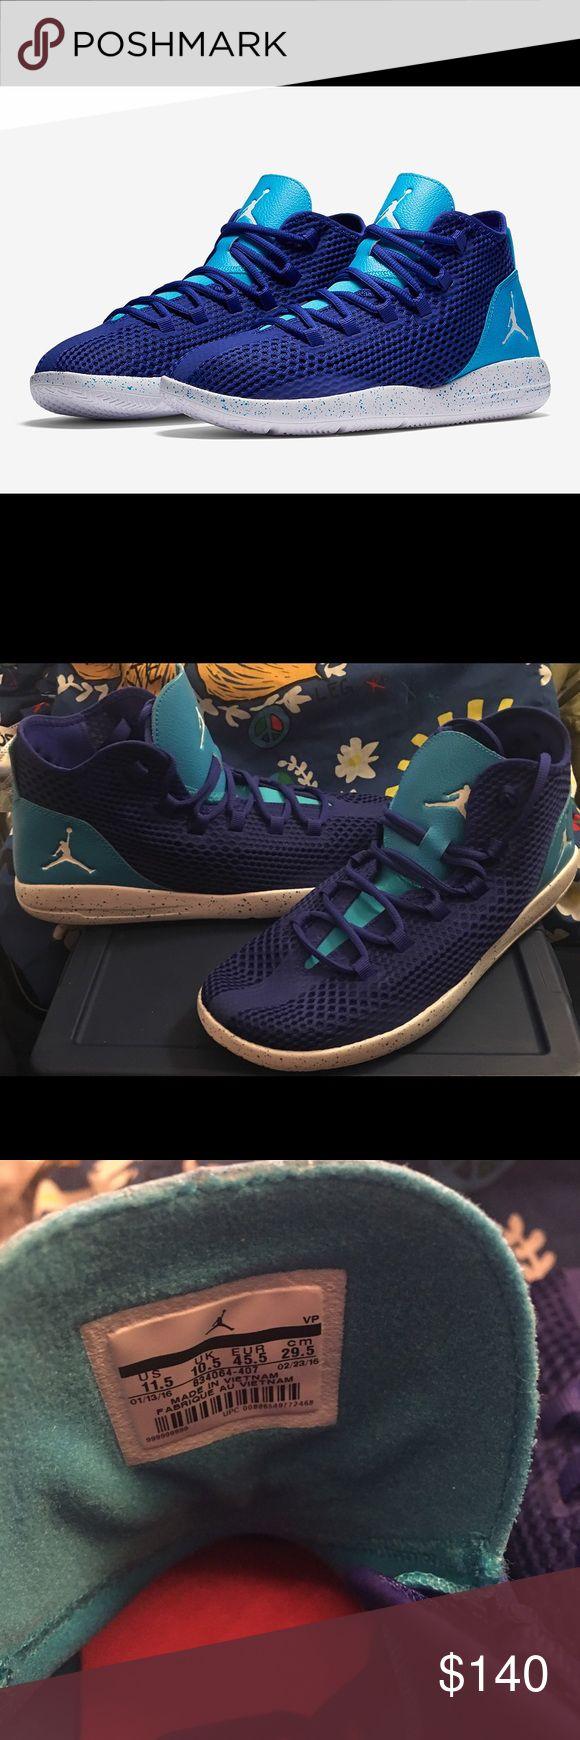 rare Jordan Reveal Hornets sz 11.5 Nike Air Jordan Reveal HORNETS sz 11.5 Concord Blue TURQUOISE 13 xiii low v. New NO BOX Nike Shoes